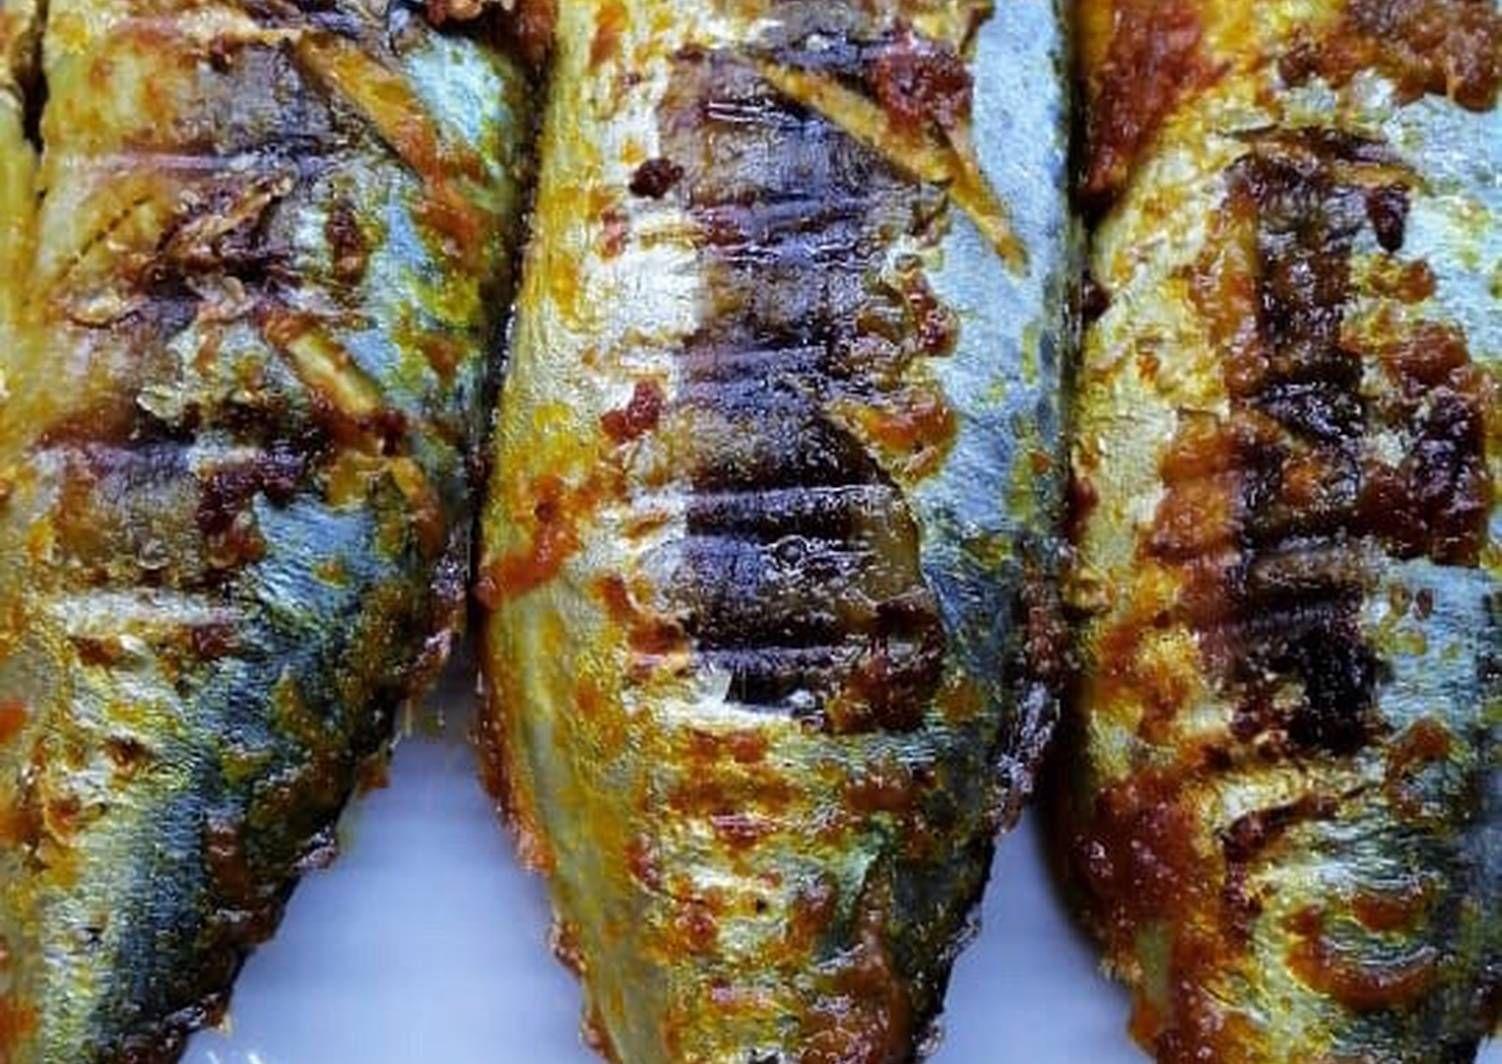 Resep Gembung Bakar Teflon Oleh Susi Agung Resep Resep Resep Ikan Bakar Resep Masakan Indonesia